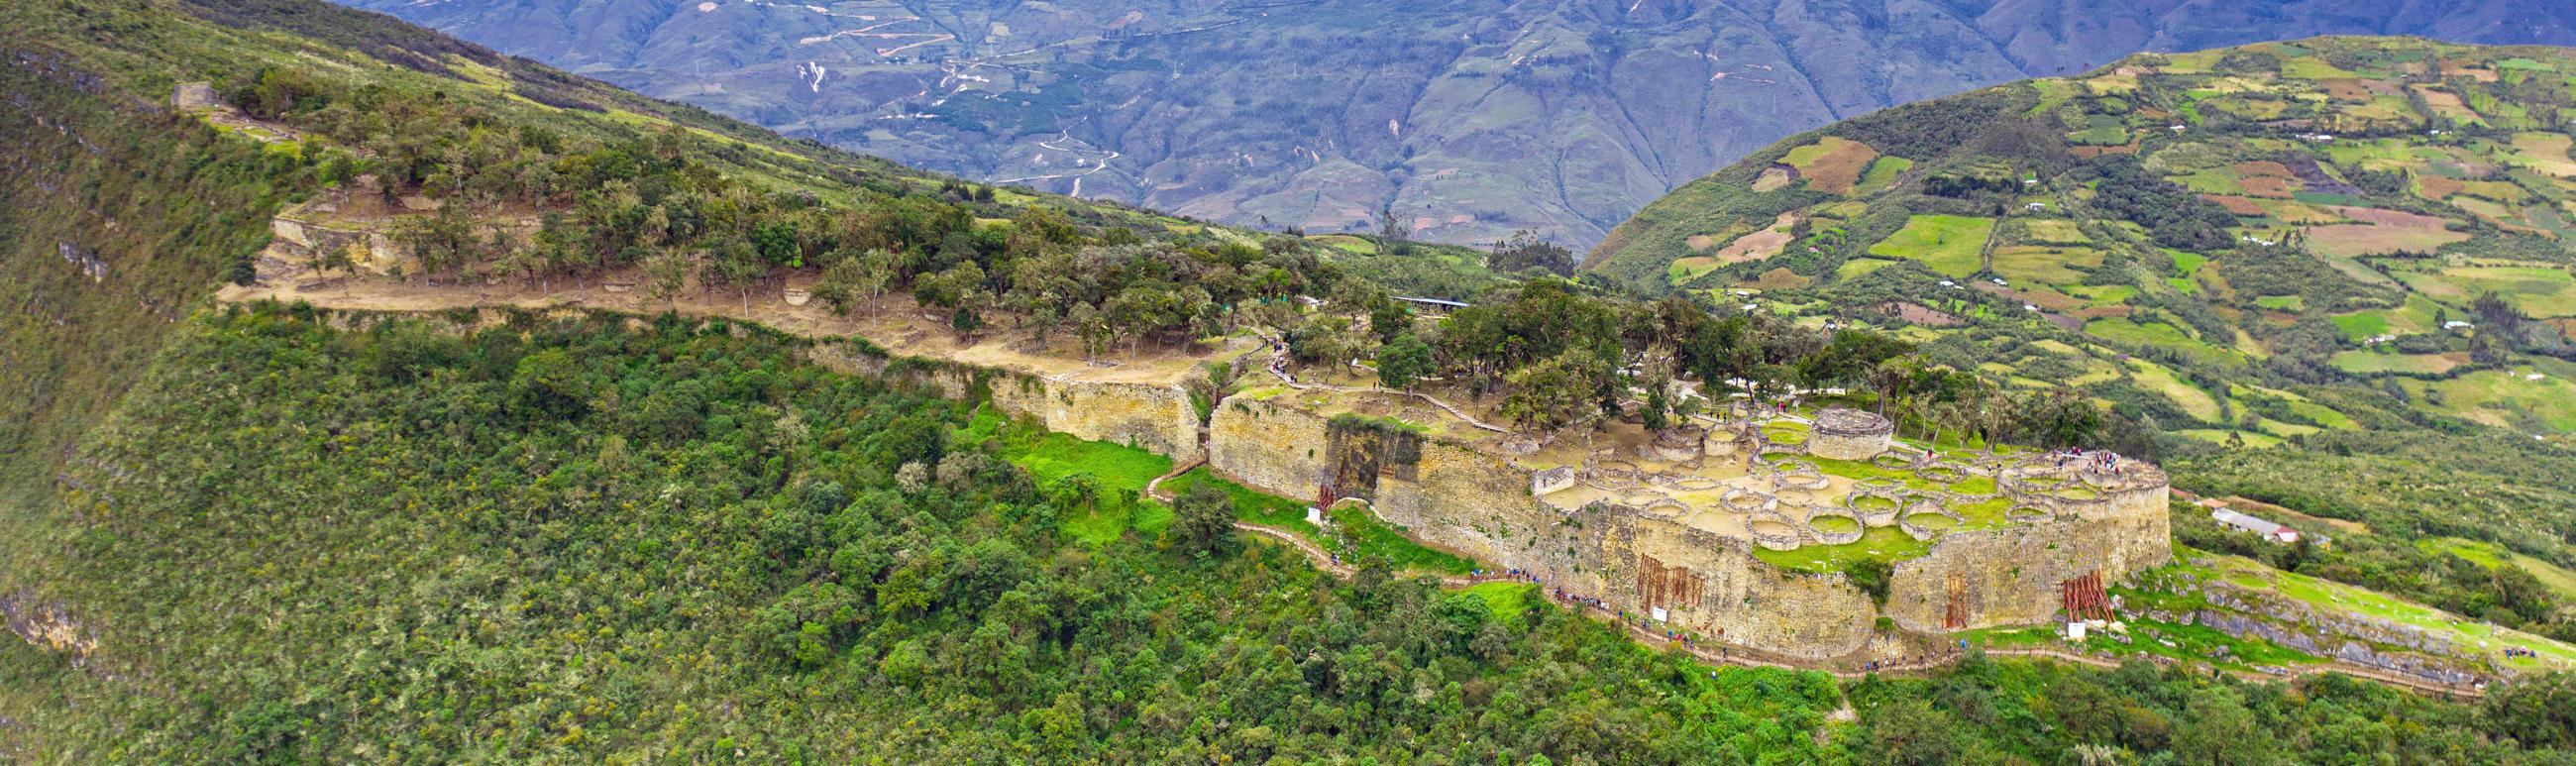 Kuelap Citadel Peru Reis Atacama1